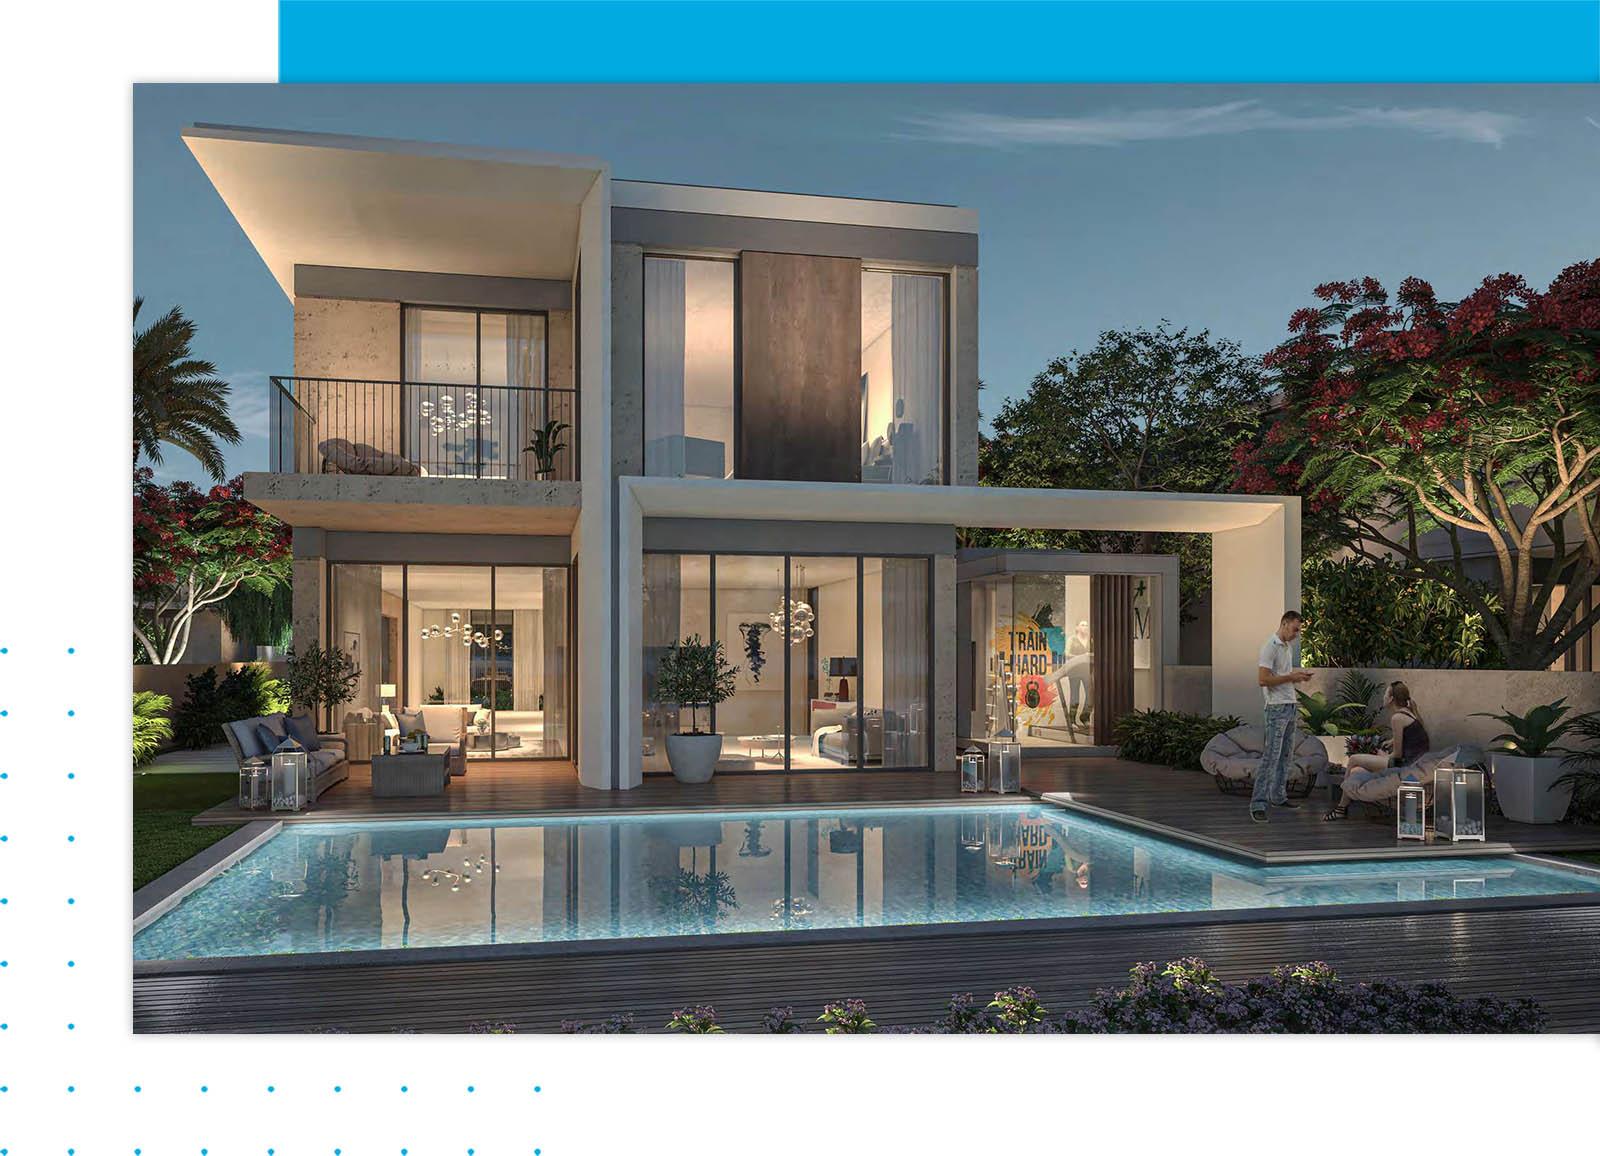 About Tilal Al Ghaf Harmony Villas